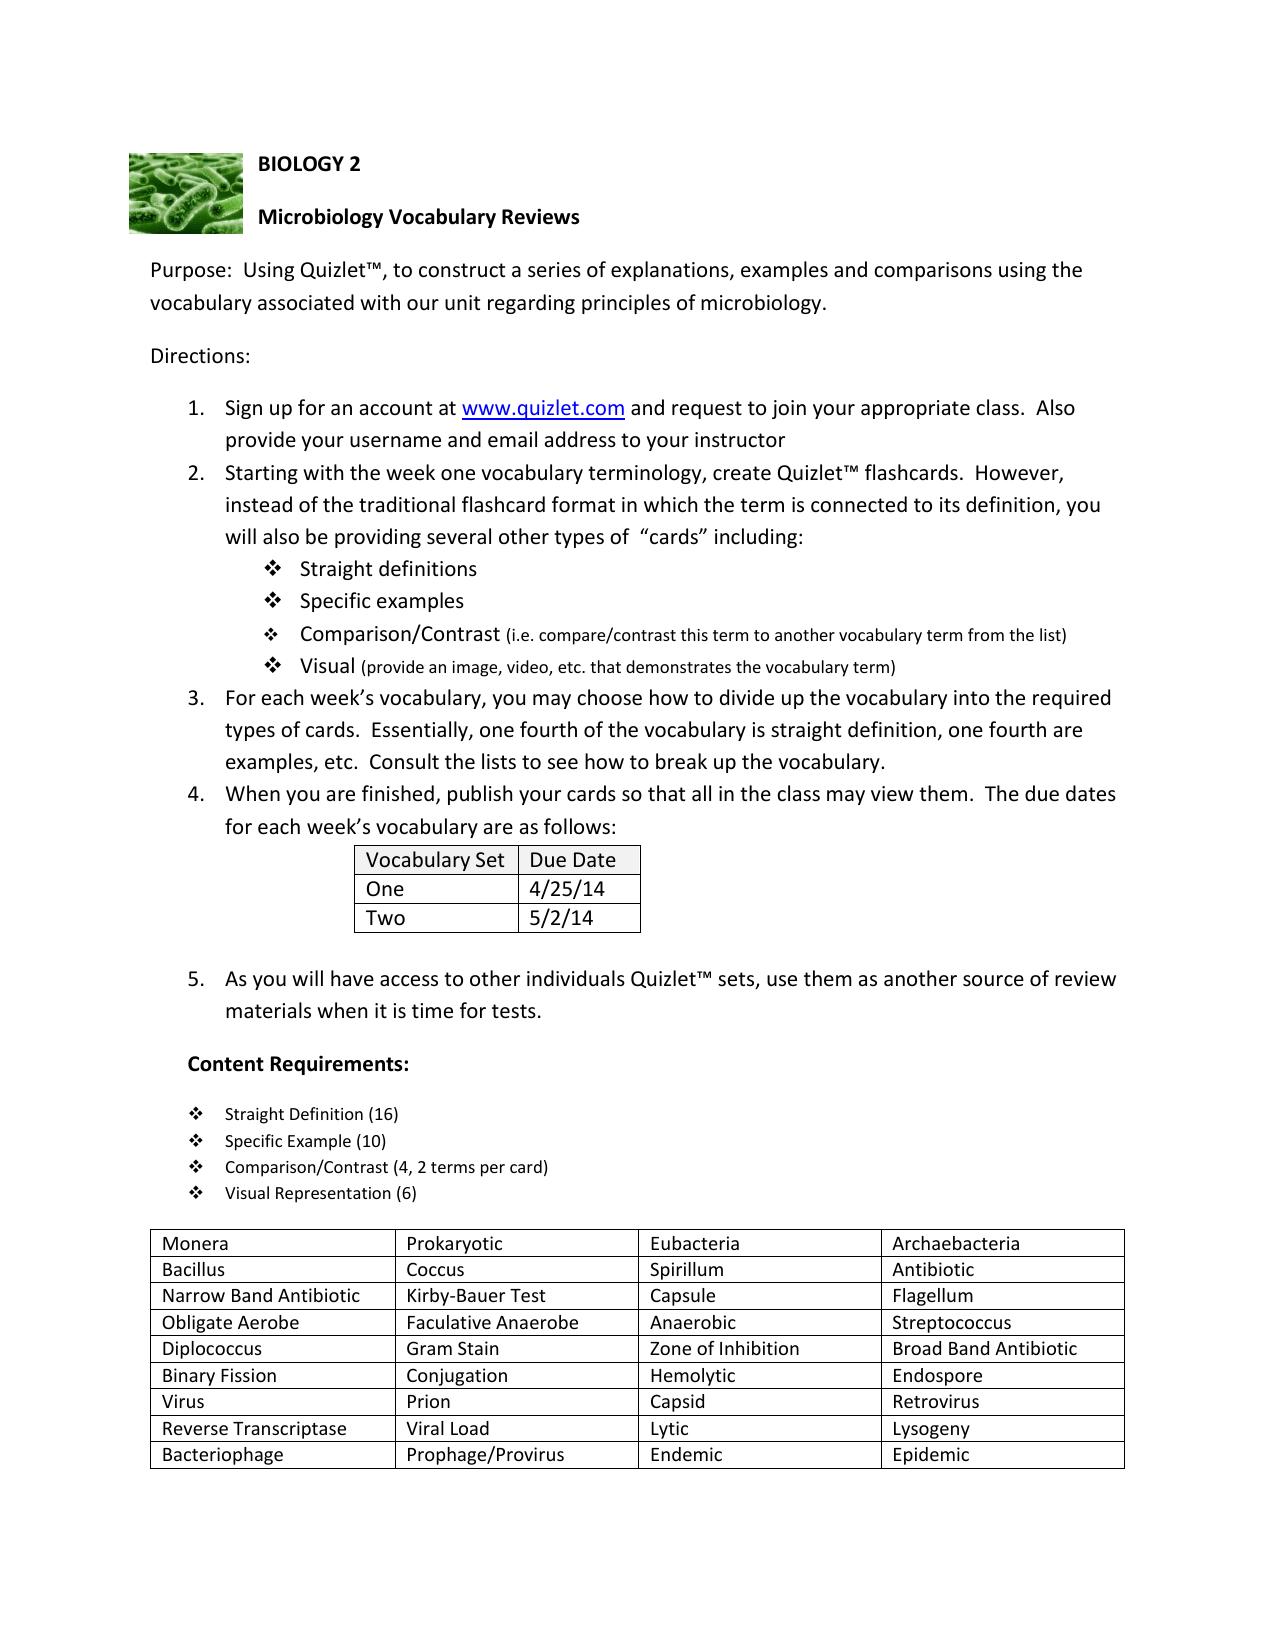 BIOLOGY 2 Microbiology Vocabulary Reviews Purpose: Using